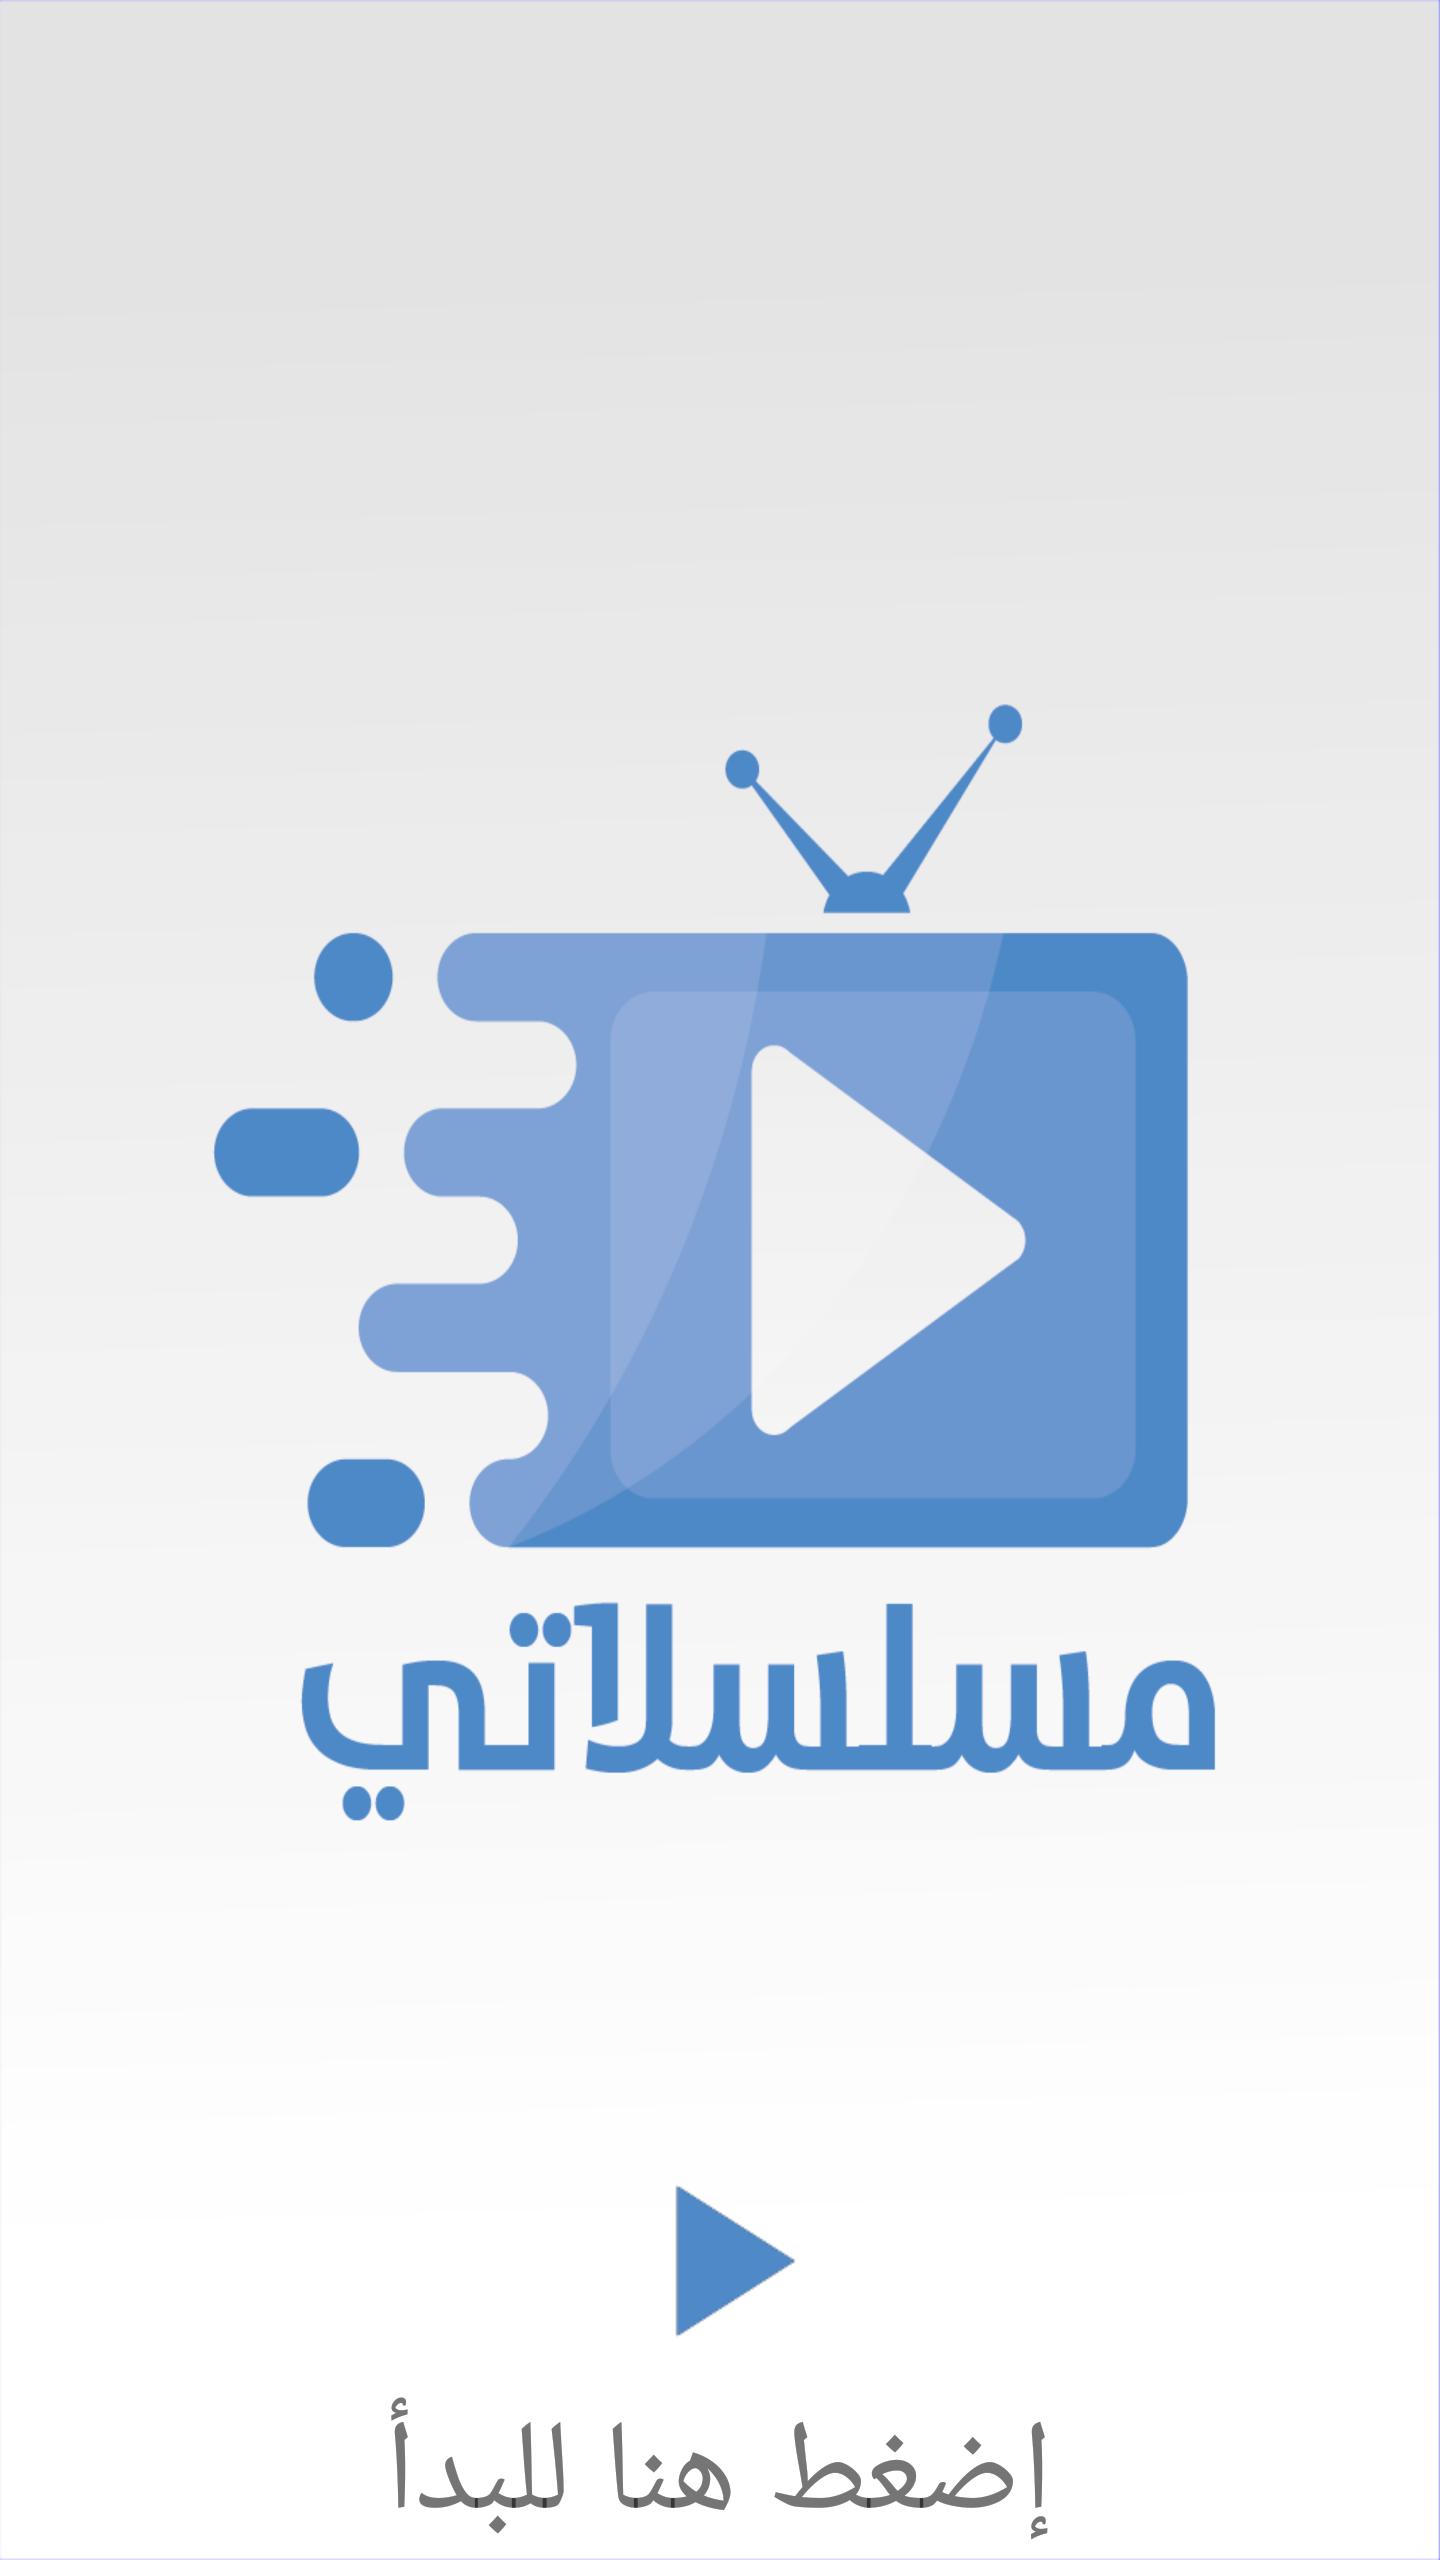 Photo of تطبيق مسلسلاتي لمتابعه احدث المسلسلات العربيه و الاجنبيه